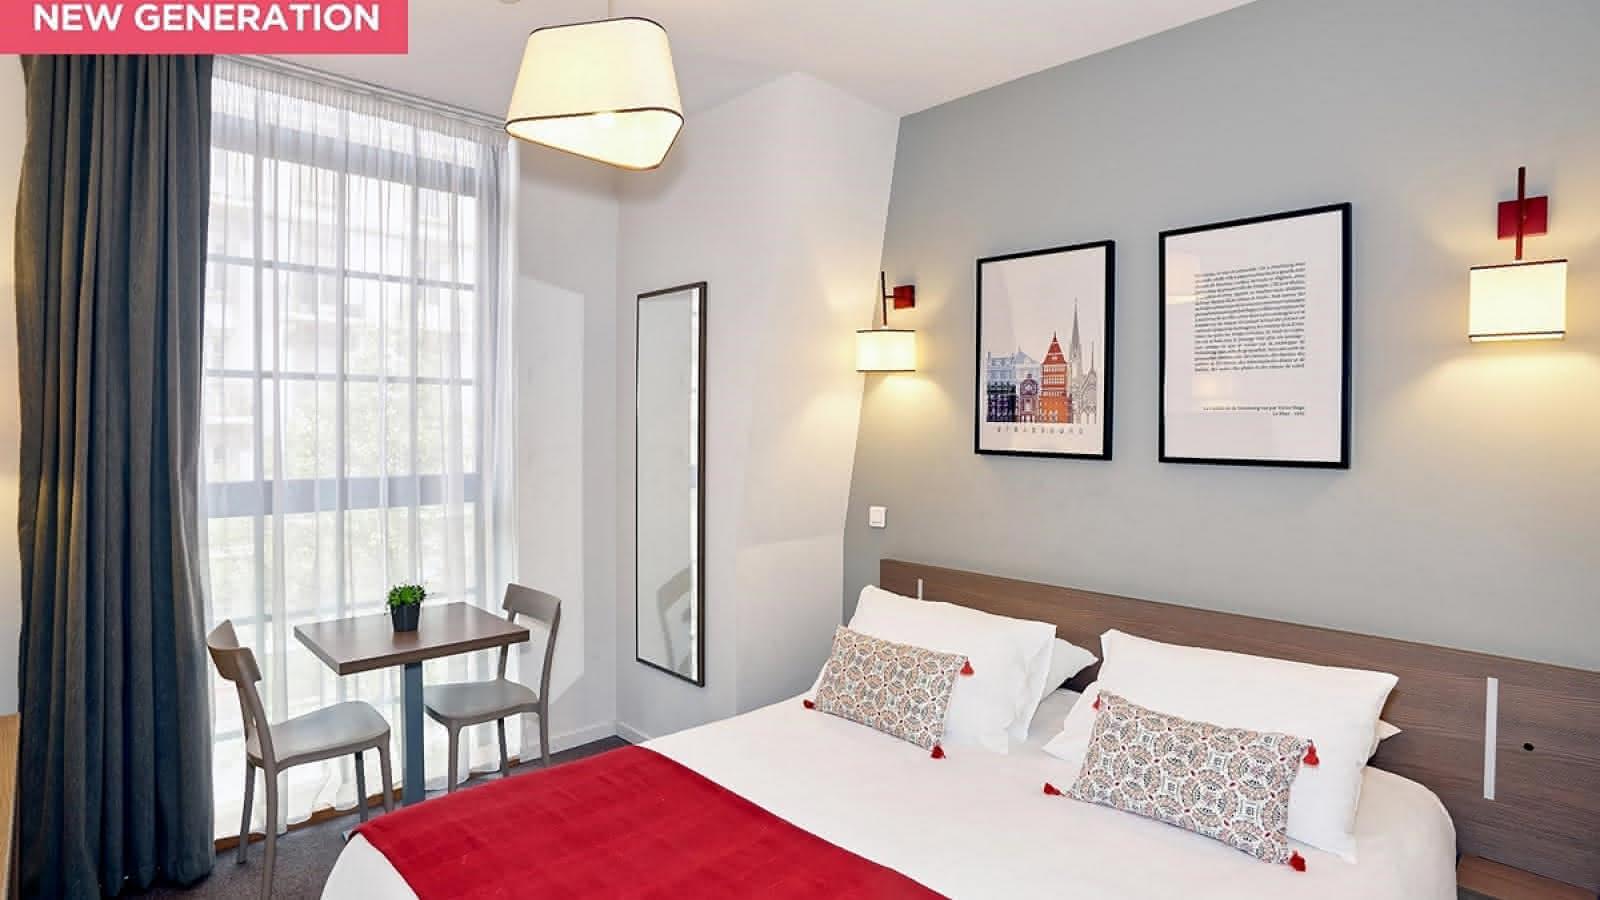 appartement à louer: Appartement A Louer Rue Sellenick ...